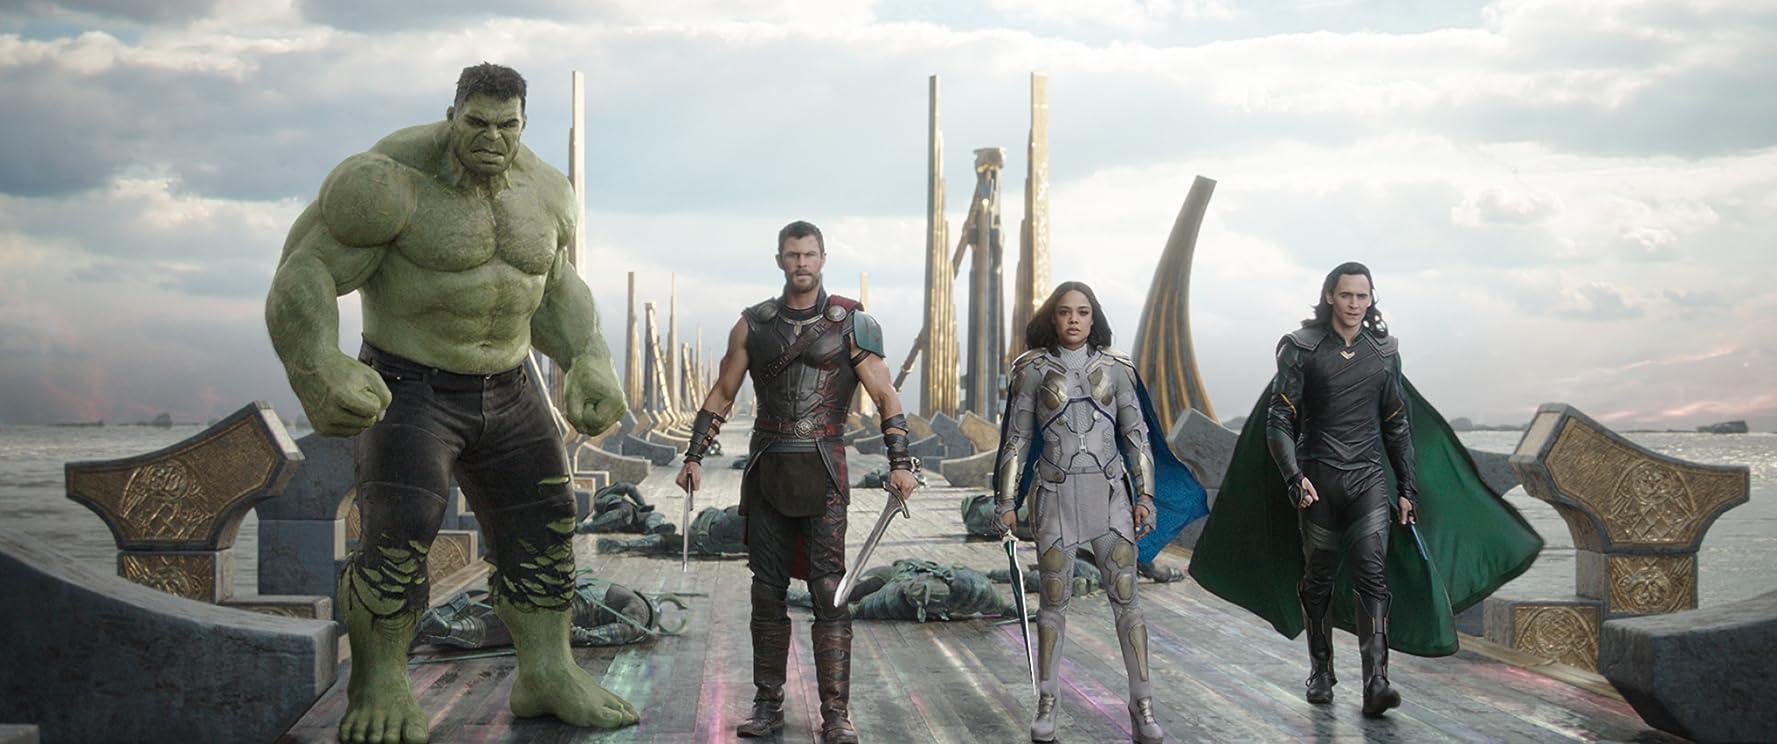 Mark Ruffalo, Tom Hiddleston, Chris Hemsworth, and Tessa Thompson in Thor: Ragnarok (2017)